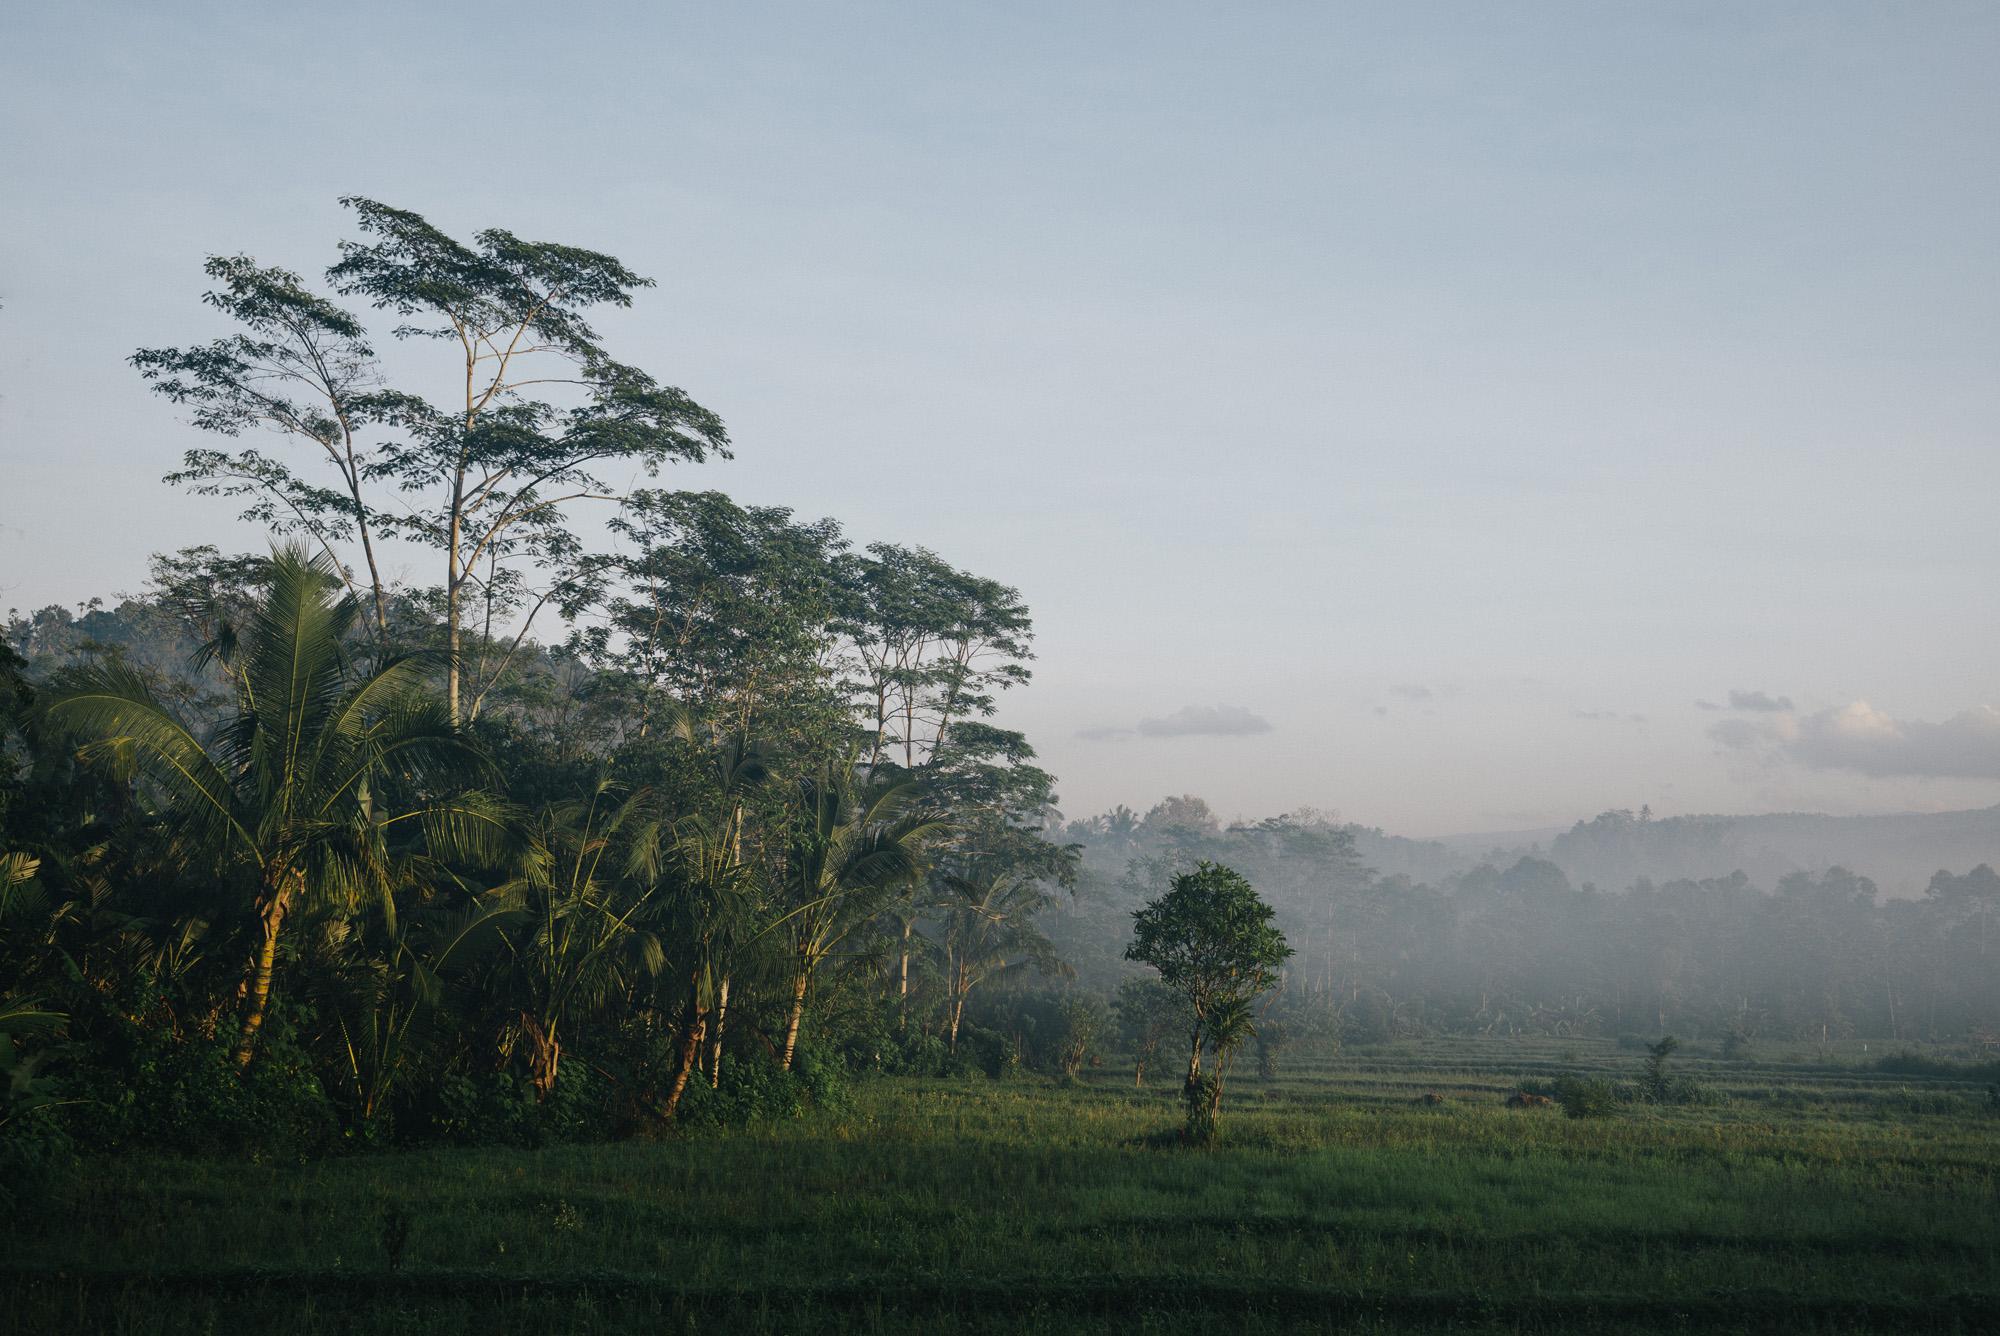 Hazy Morning in Sidemen, Bali